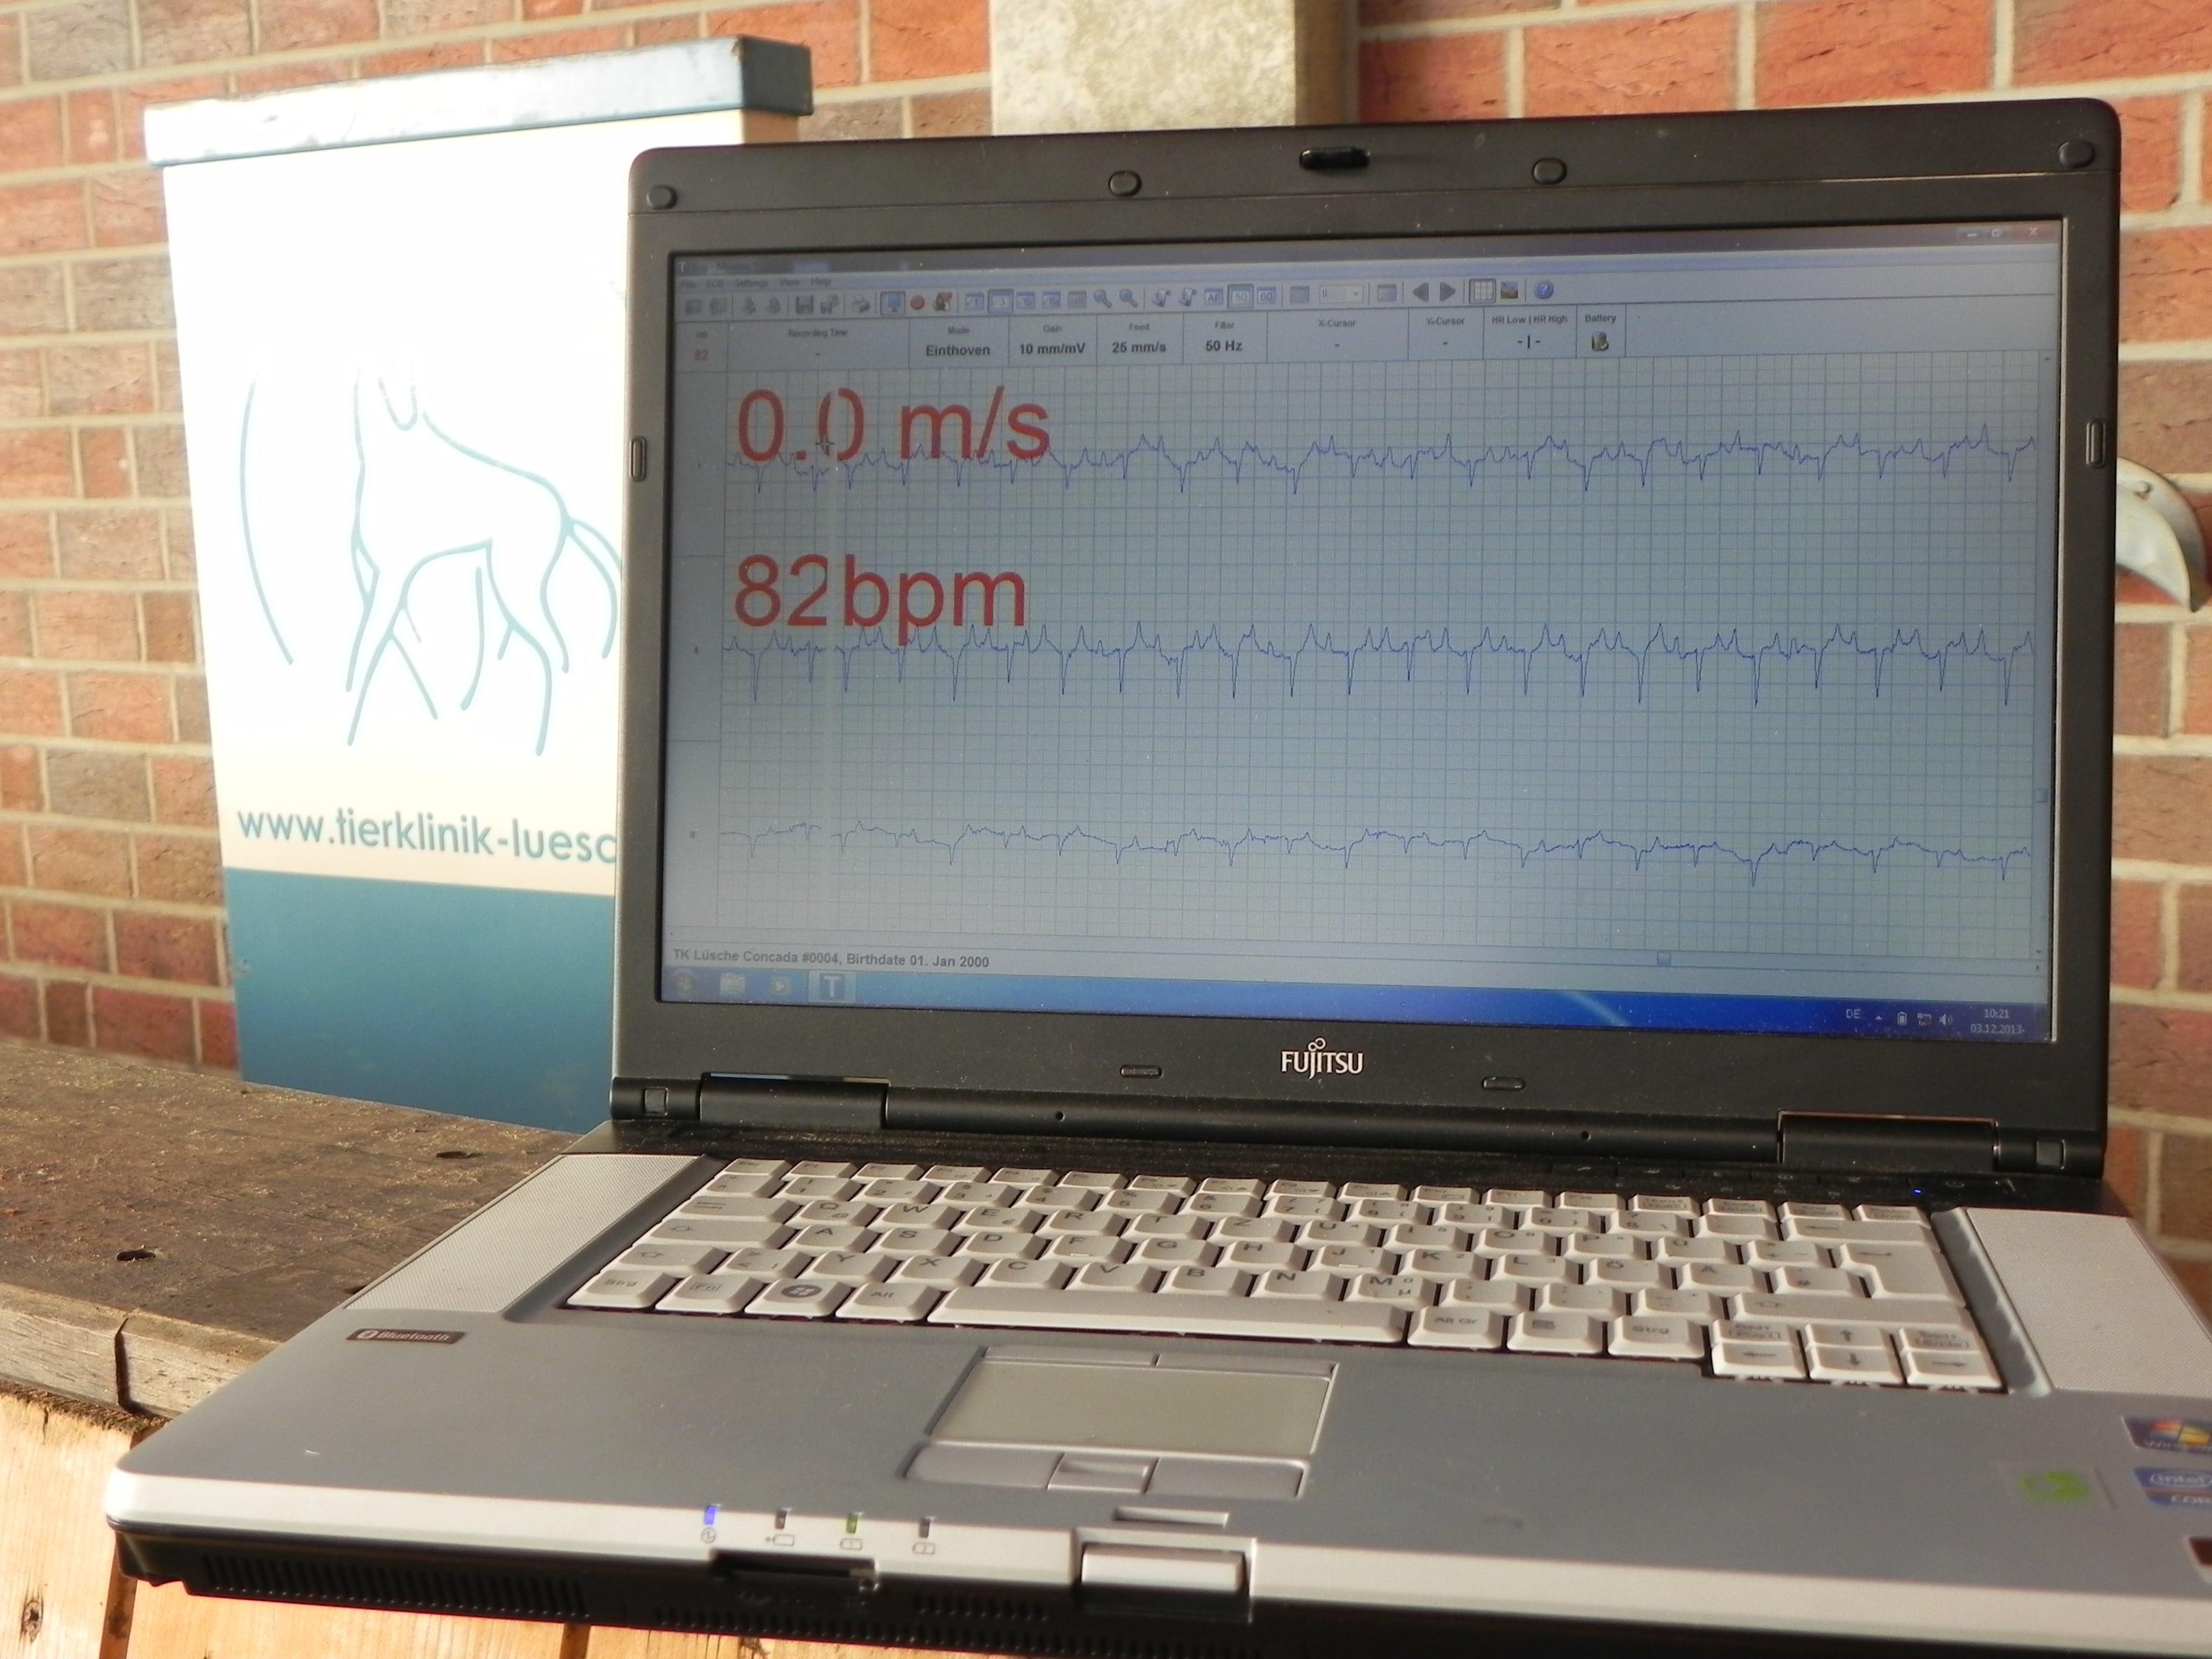 Belastungs-EKG, Betrachtung während Aufnahme